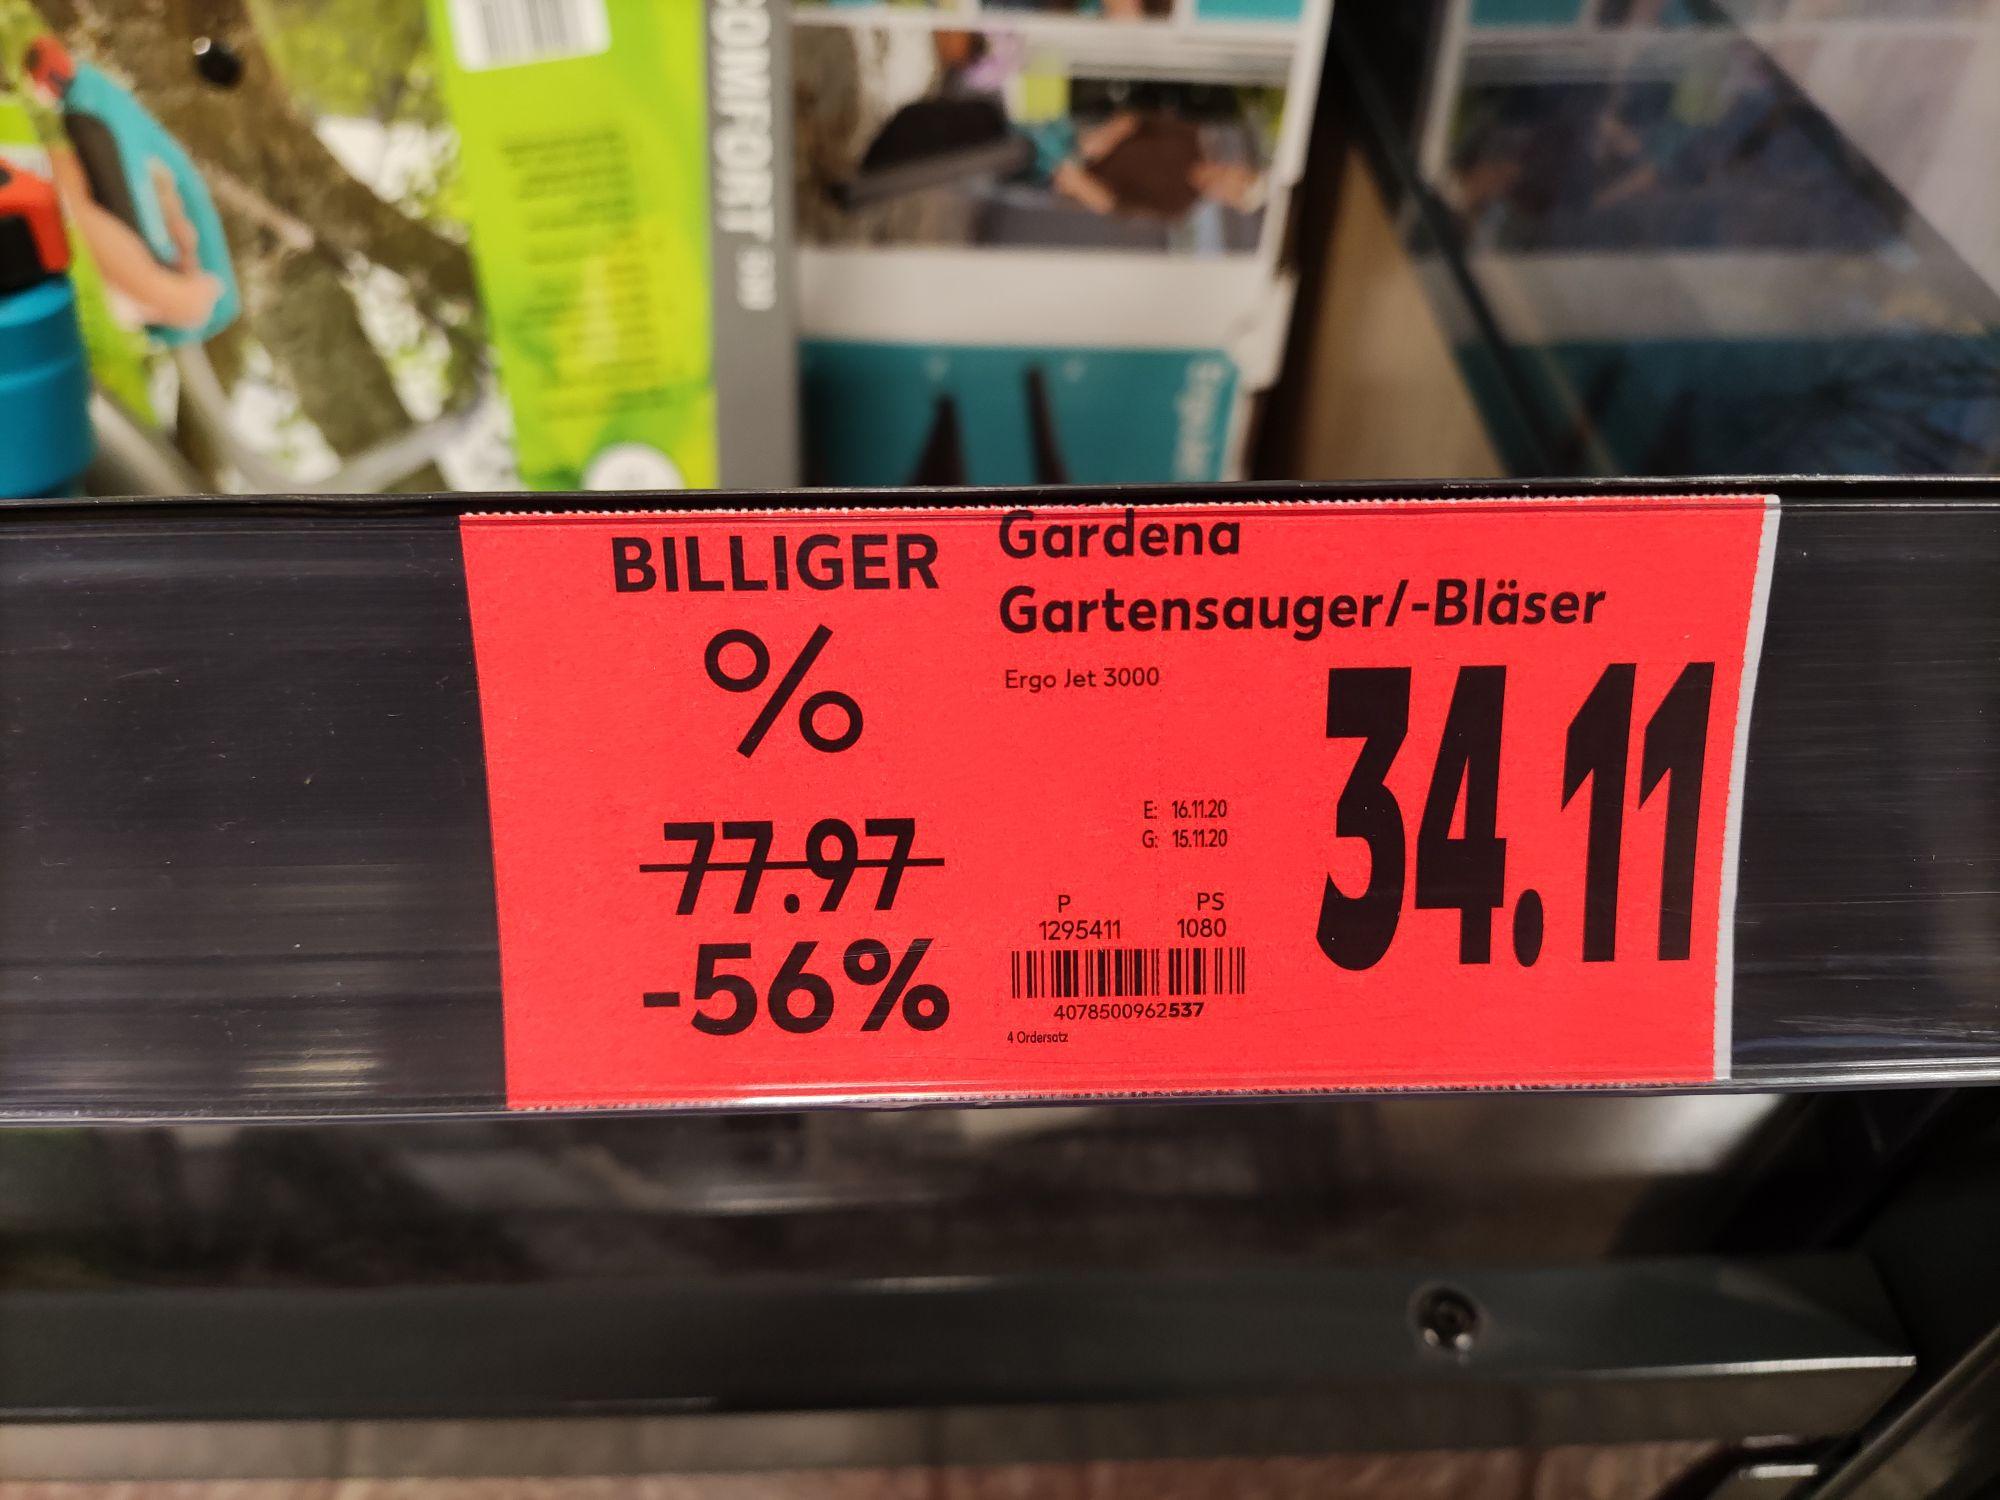 [Lokal ABG/bundesweit?] Gardena-Ausverkauf - Laubsauger/Heckenschere/Bügelsäge/Beil